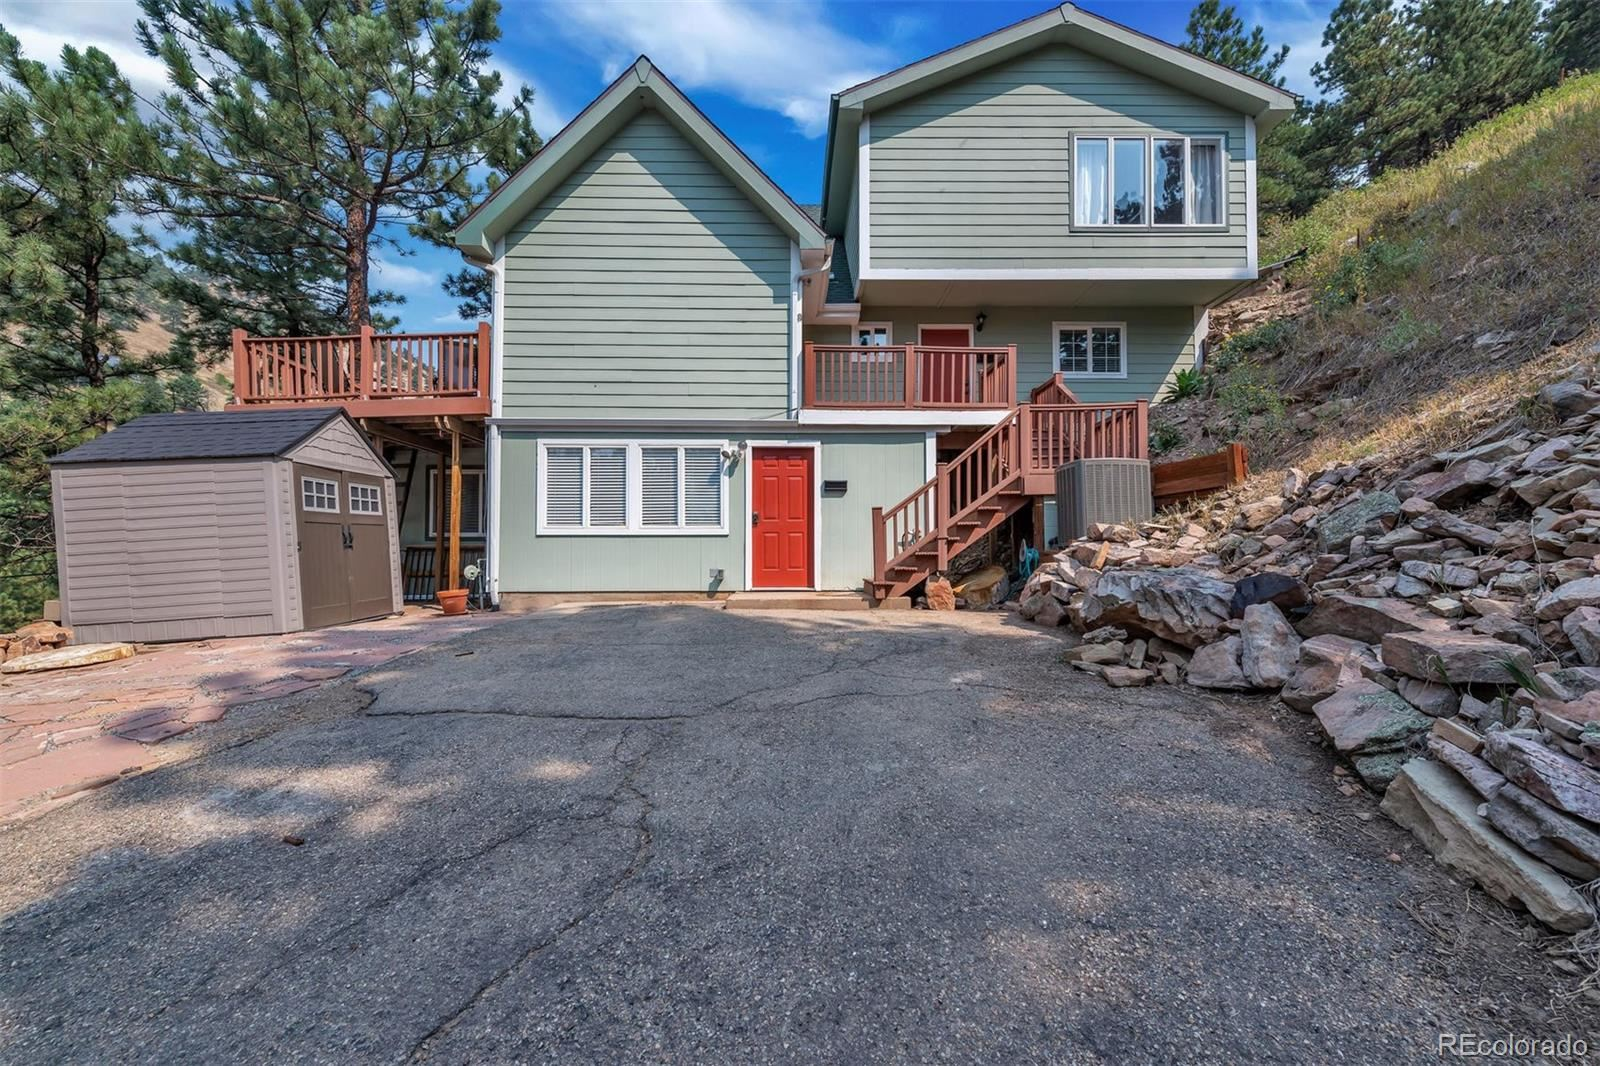 93 PINE NEEDLE Road, Boulder, CO 80304 - #: 8928248